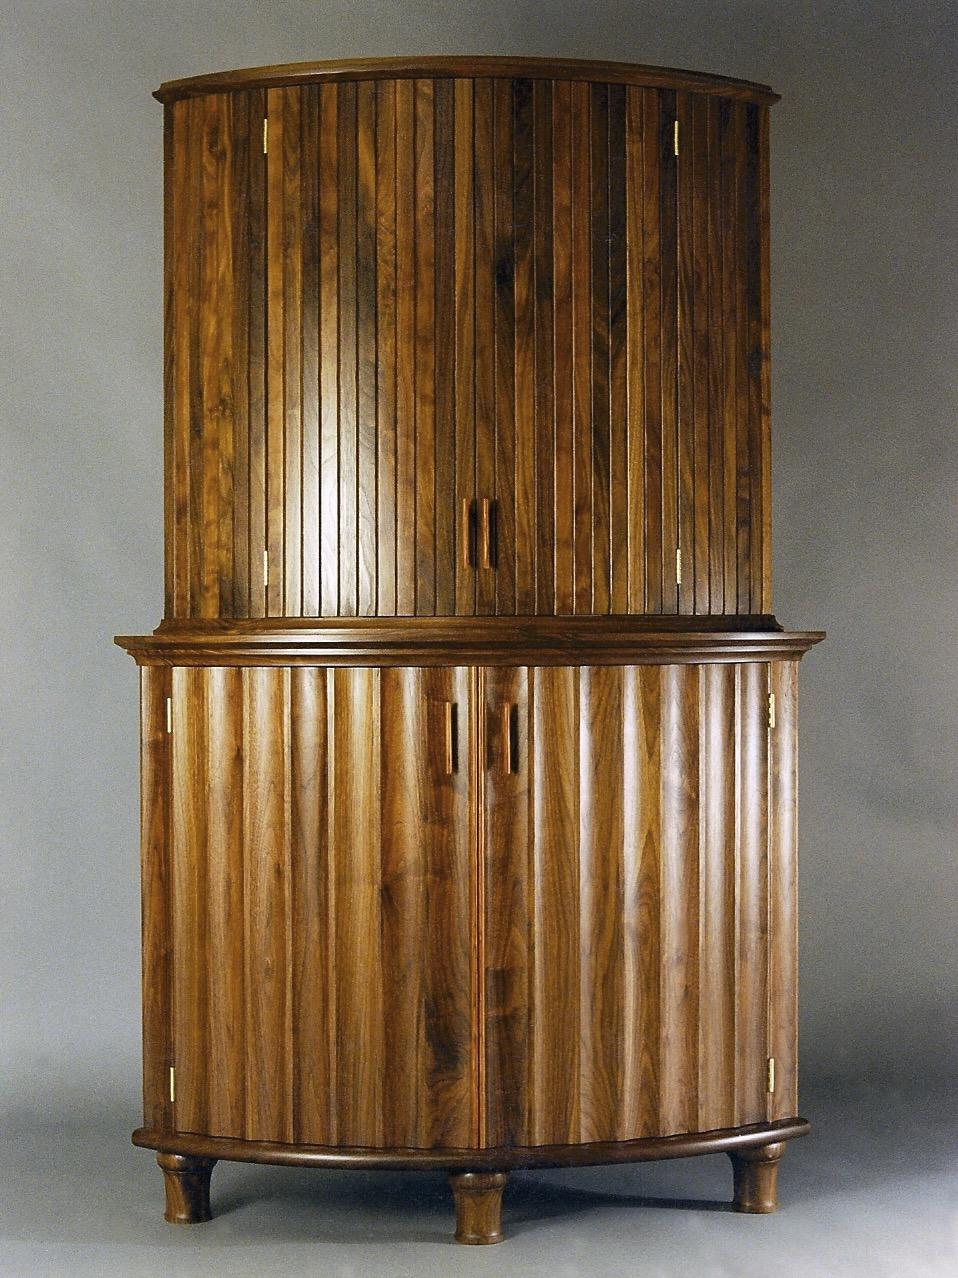 Kowitz - walnut, redwood burl interior